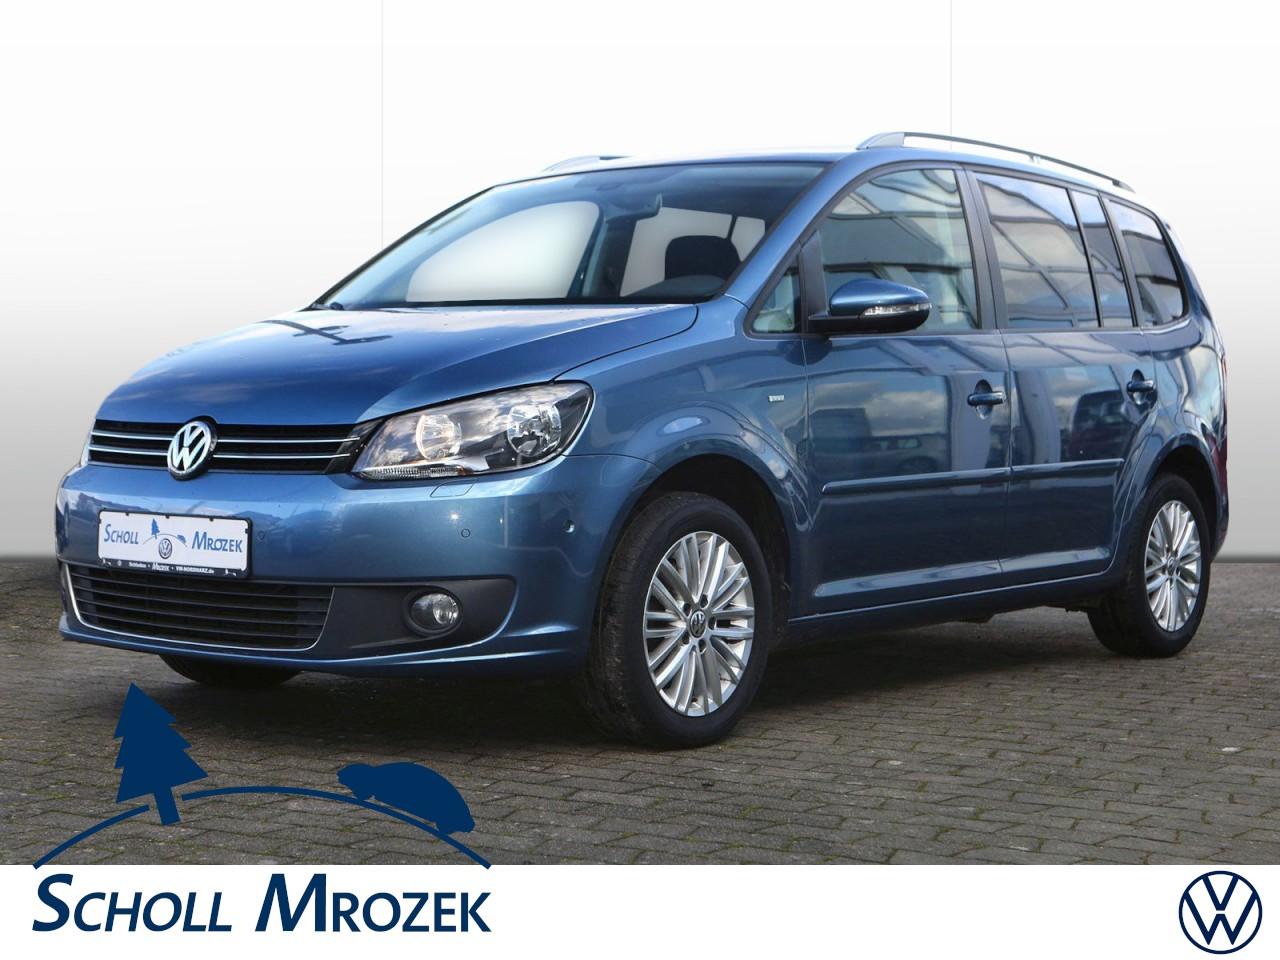 Volkswagen Touran CUP 1.6 TDI, Klimaautomatik, SH. PDC, Jahr 2014, Diesel